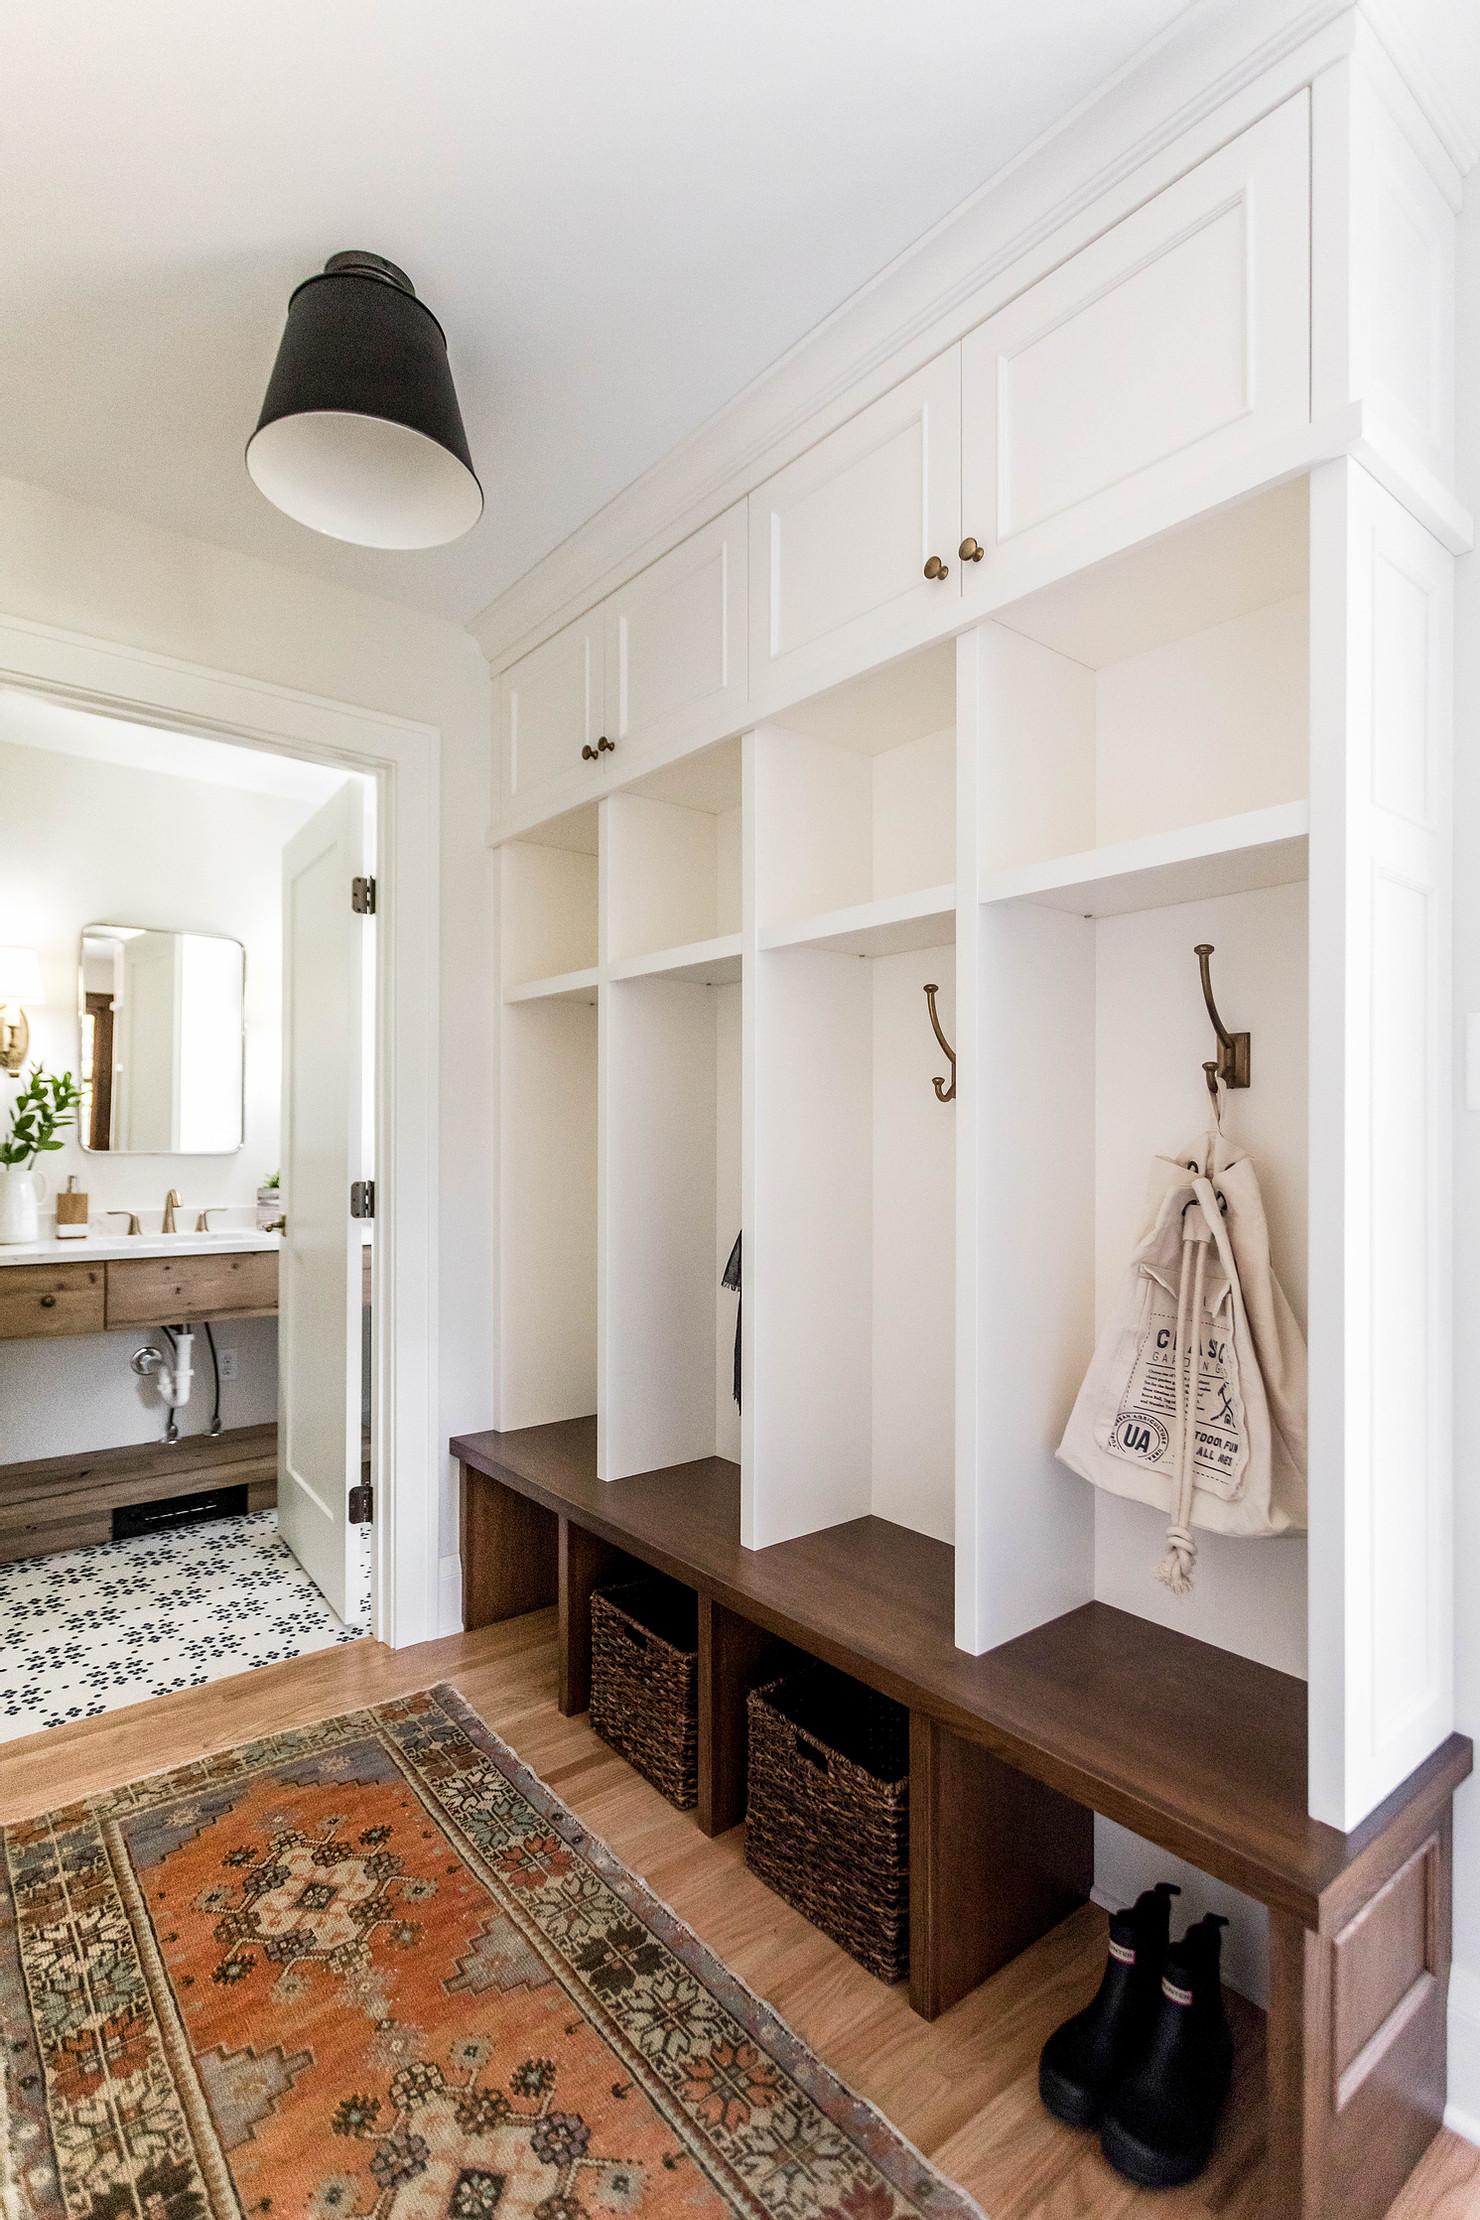 mudroom with hooks and bathroom